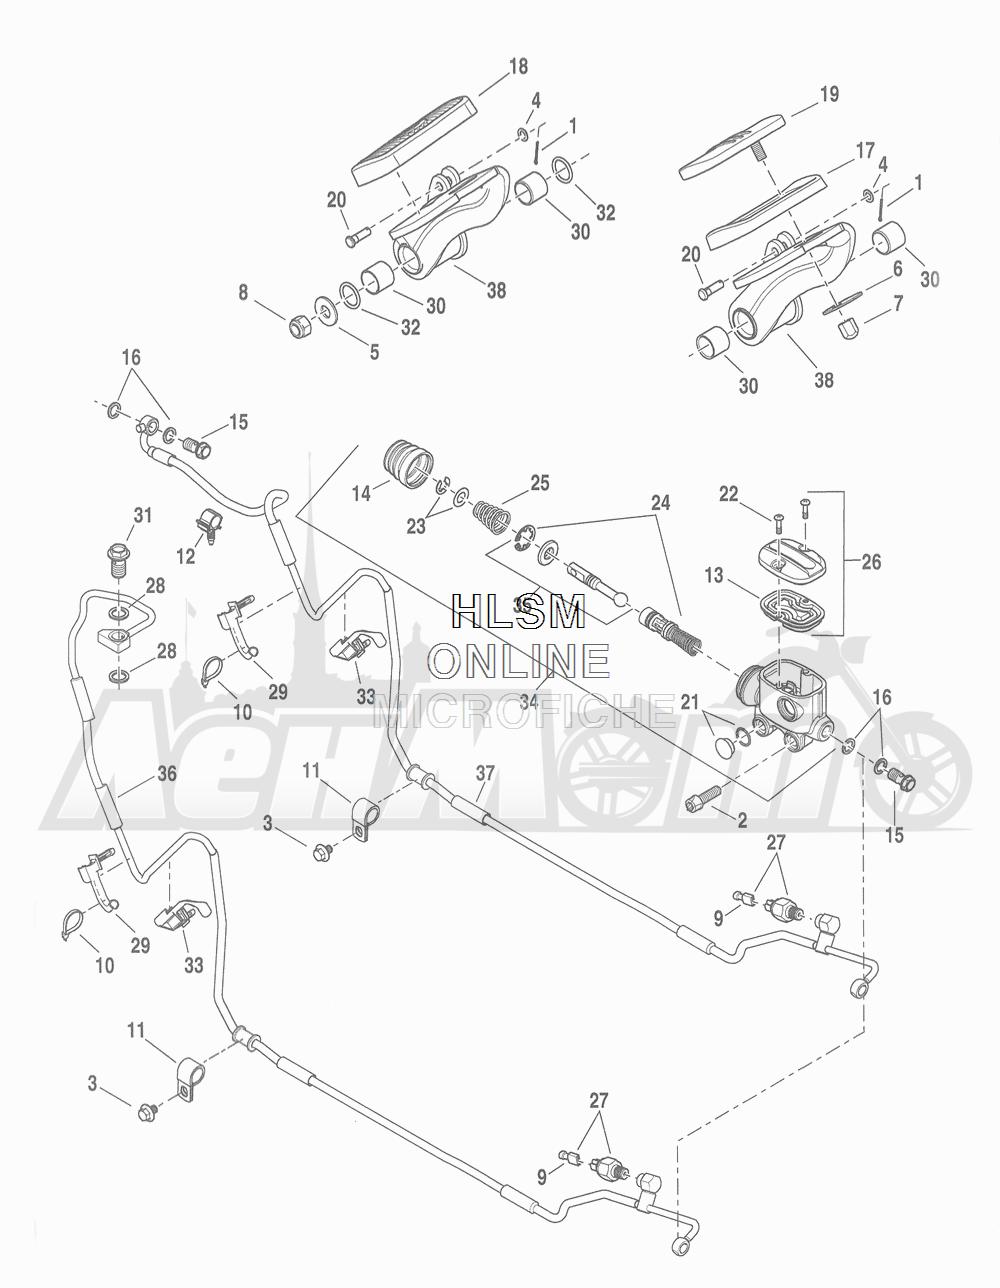 Запчасти для Мотоцикла Harley-Davidson 2016 FLHTCU 103 ULTRA CLASSIC ELECTRAGLIDE (FCM) Раздел: BRAKE - REAR BRAKE CYLINDER W/ PEDAL   задний тормоз тормоза цилиндр вместе с педаль